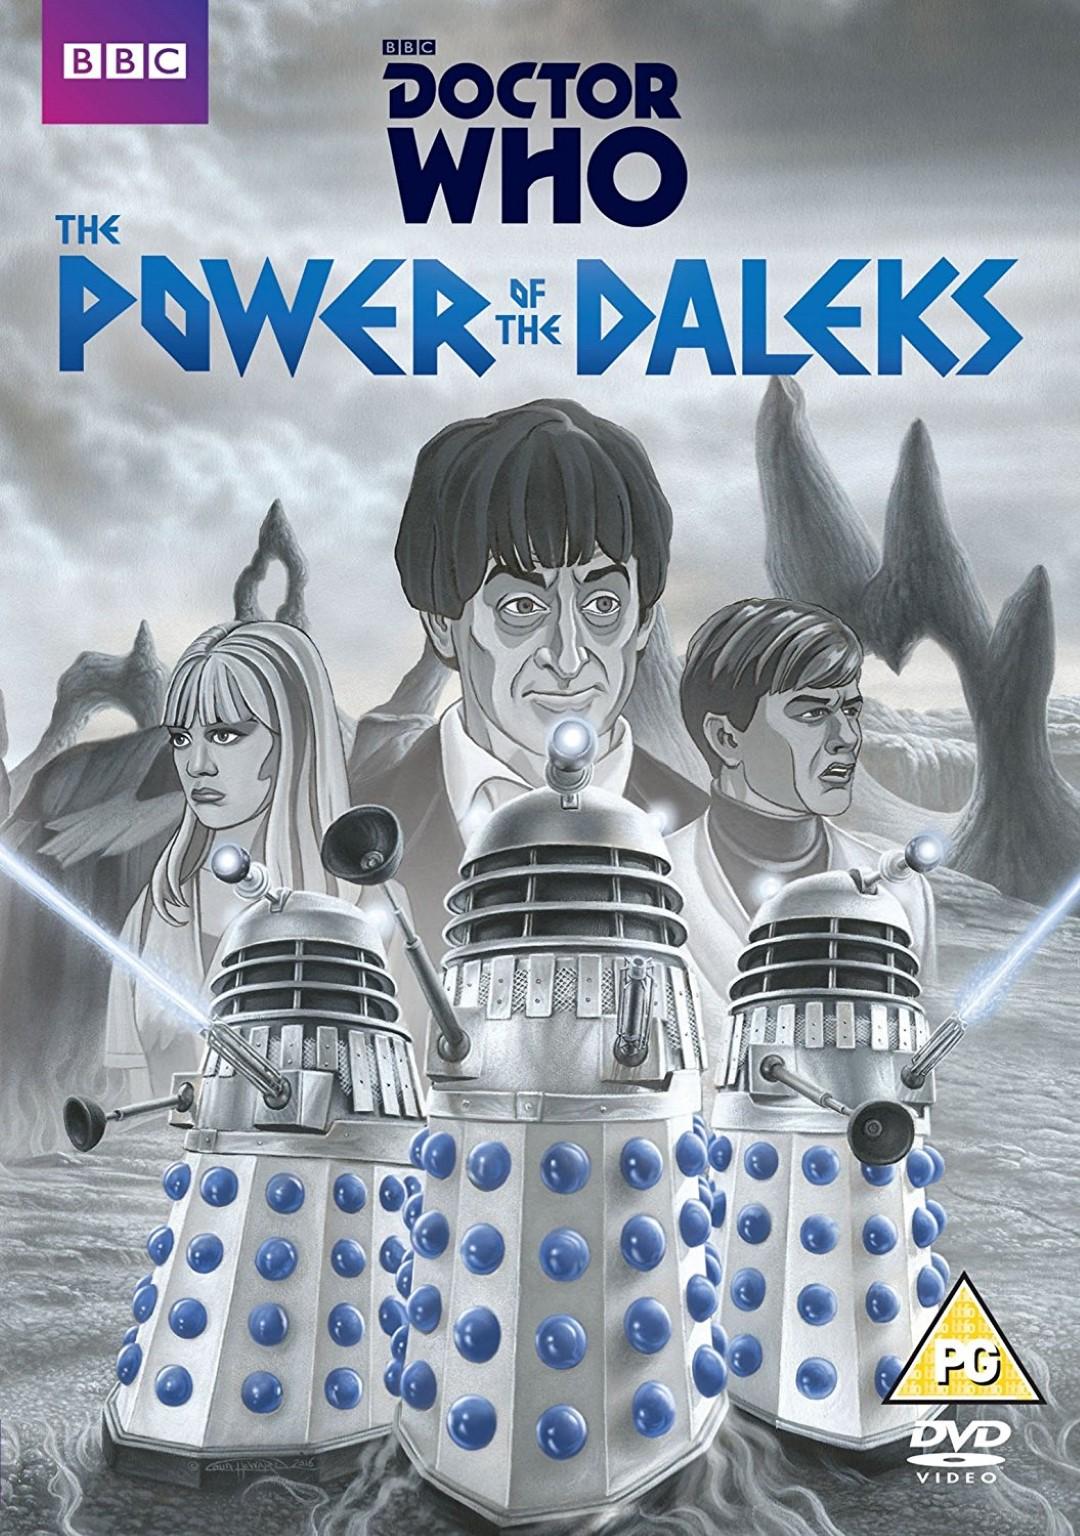 BBC DVDs